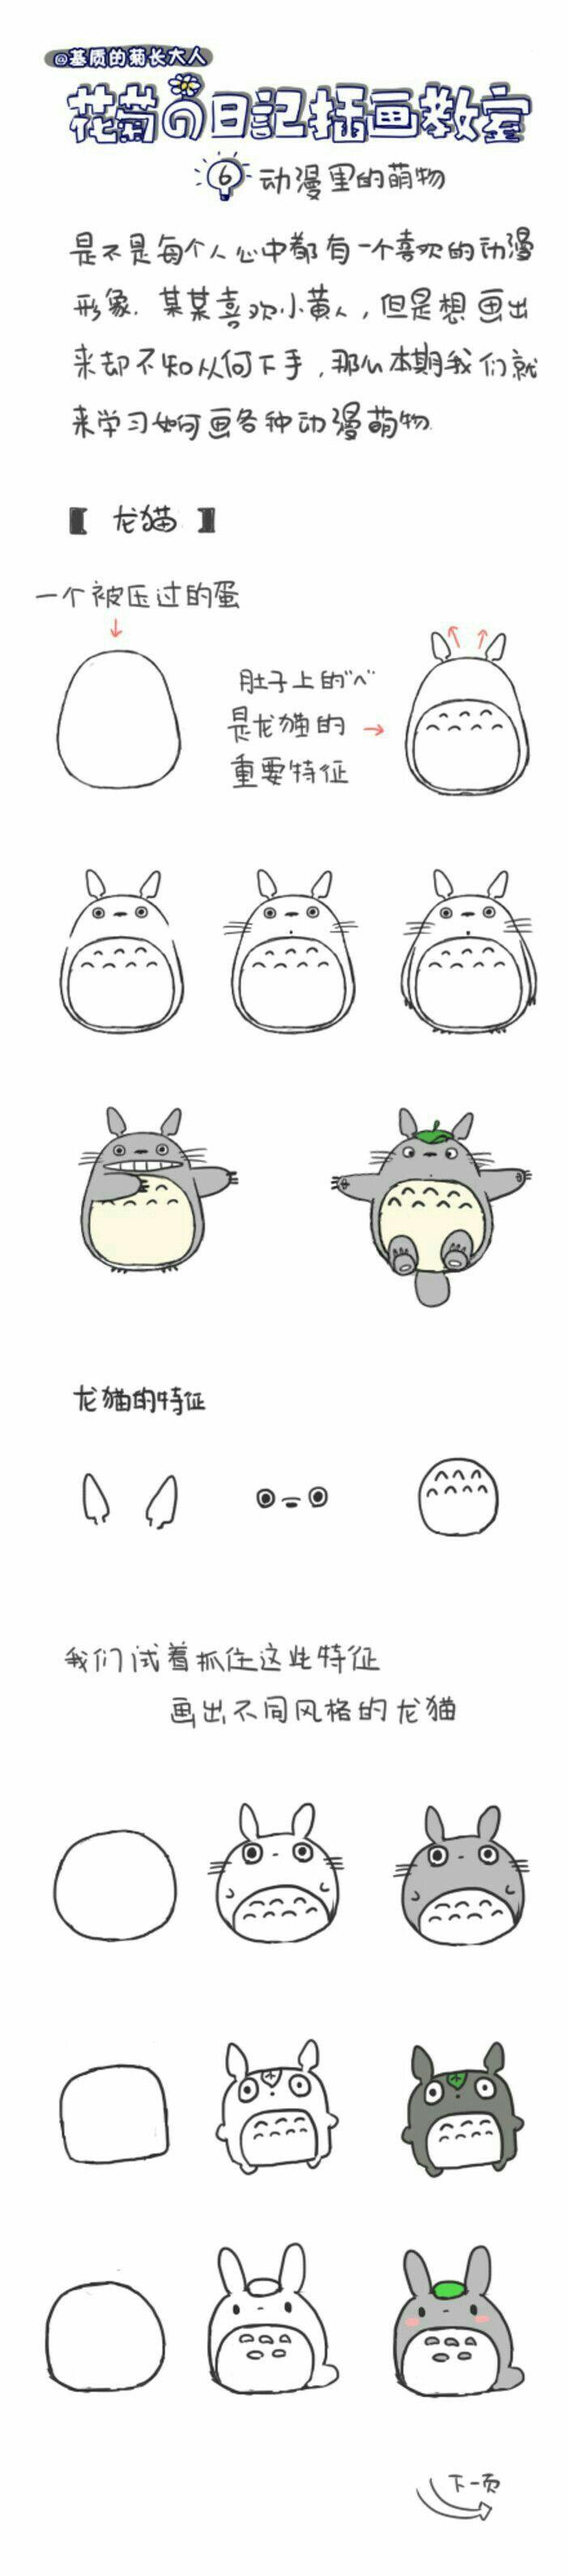 How To Draw Totoro My Neighbor Totoro Studio Ghibli How To Draw Manga Anime Kawaii Drawings Easy Drawings Cute Doodles